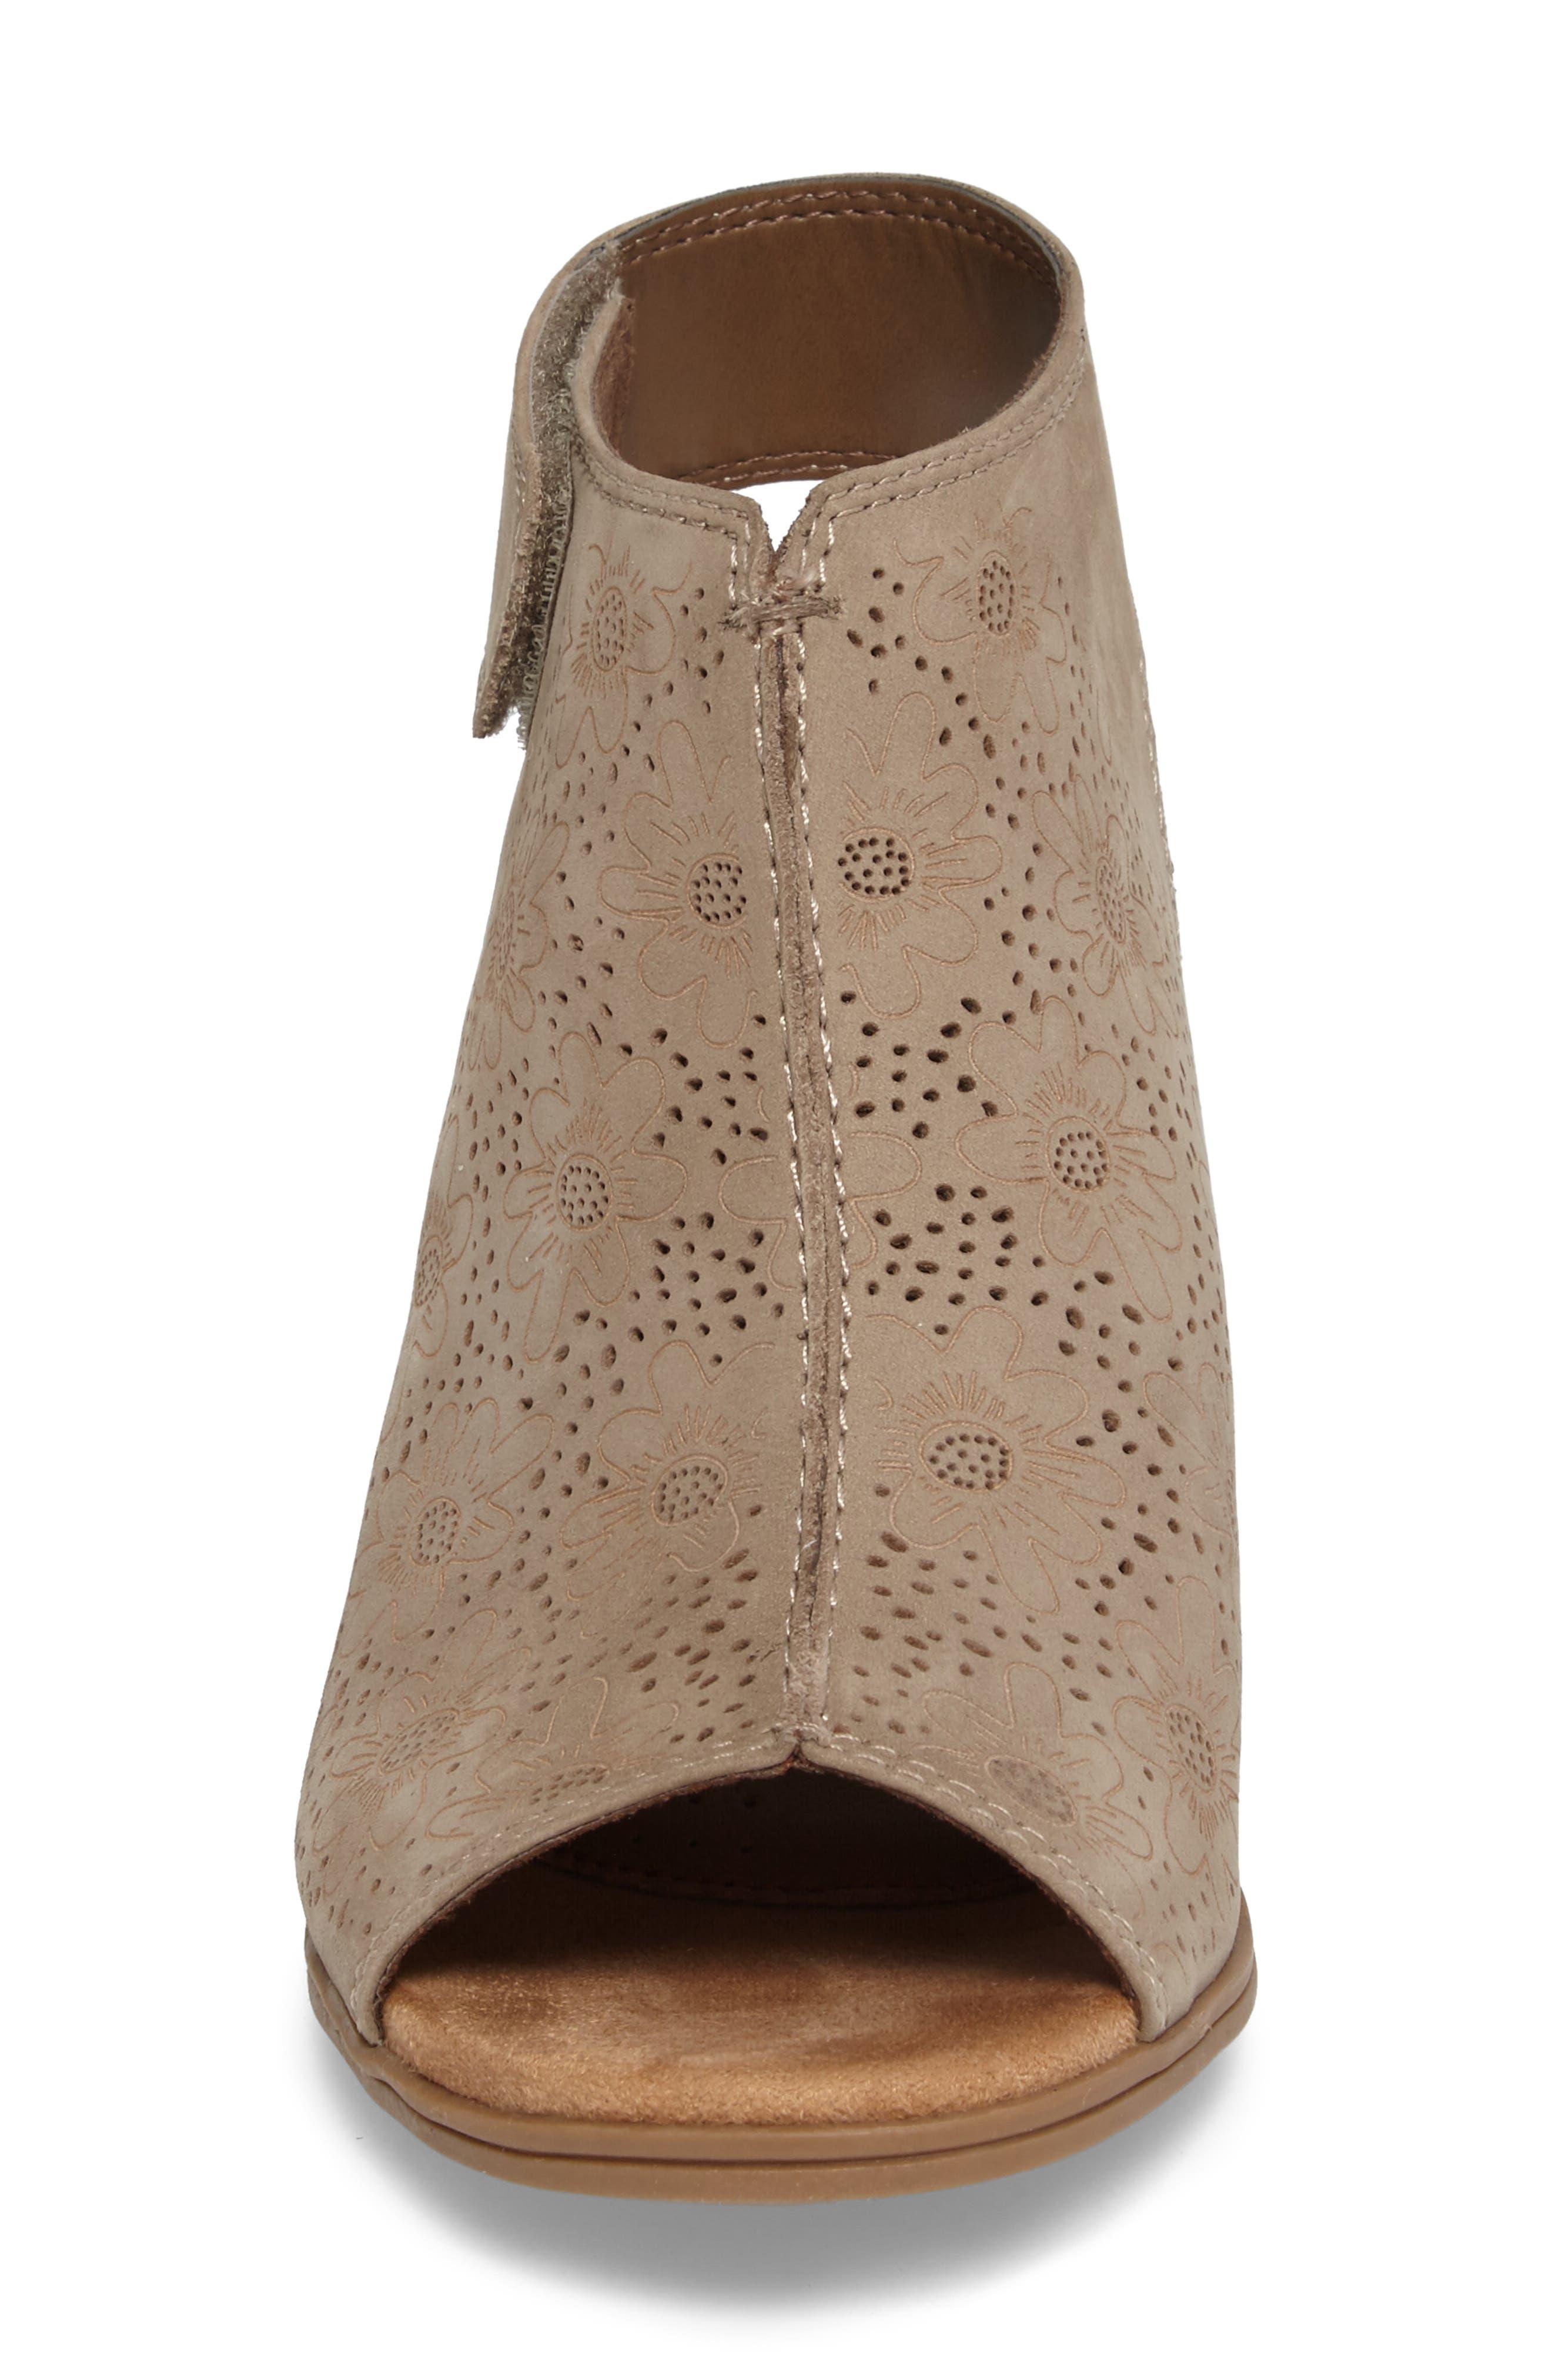 Hattie Perforated Slingback Sandal,                             Alternate thumbnail 4, color,                             KHAKI NUBUCK